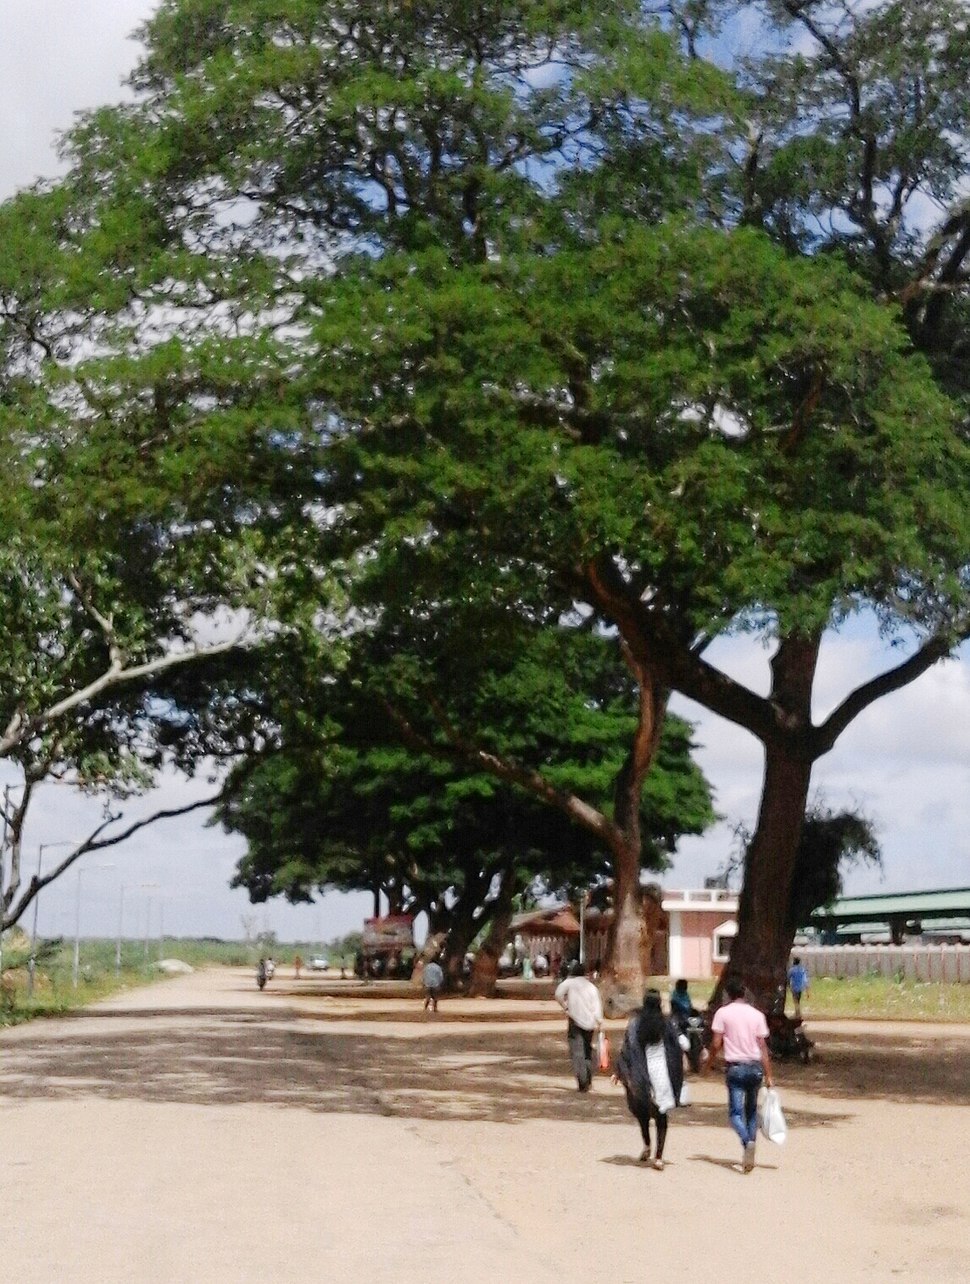 Railway Station at Chamarajanagara